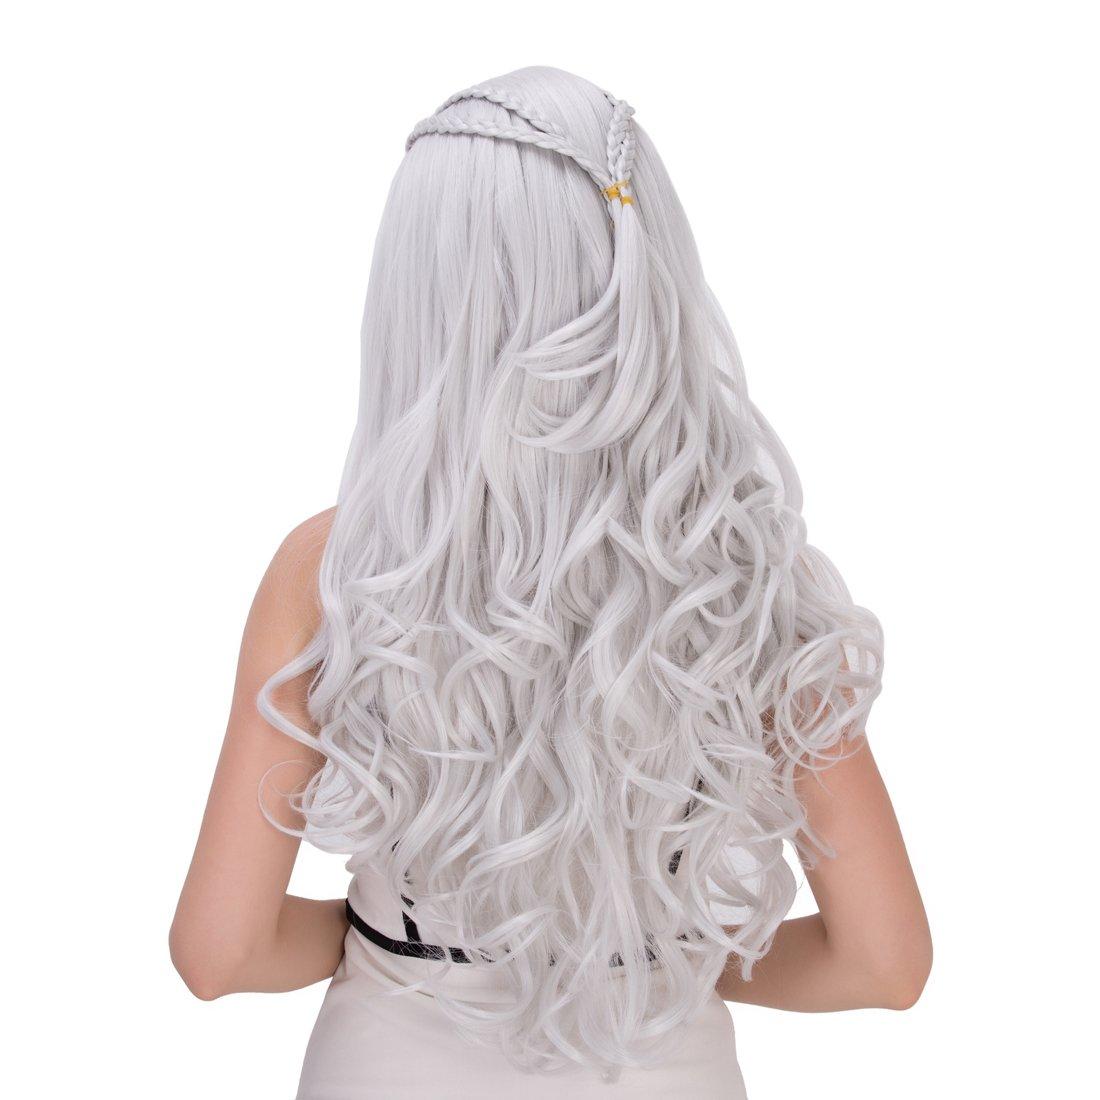 Amback largo rizado trenzado estilo Cosplay peluca de plata para el Daenerys Targaryen Khaleesi: Amazon.es: Belleza